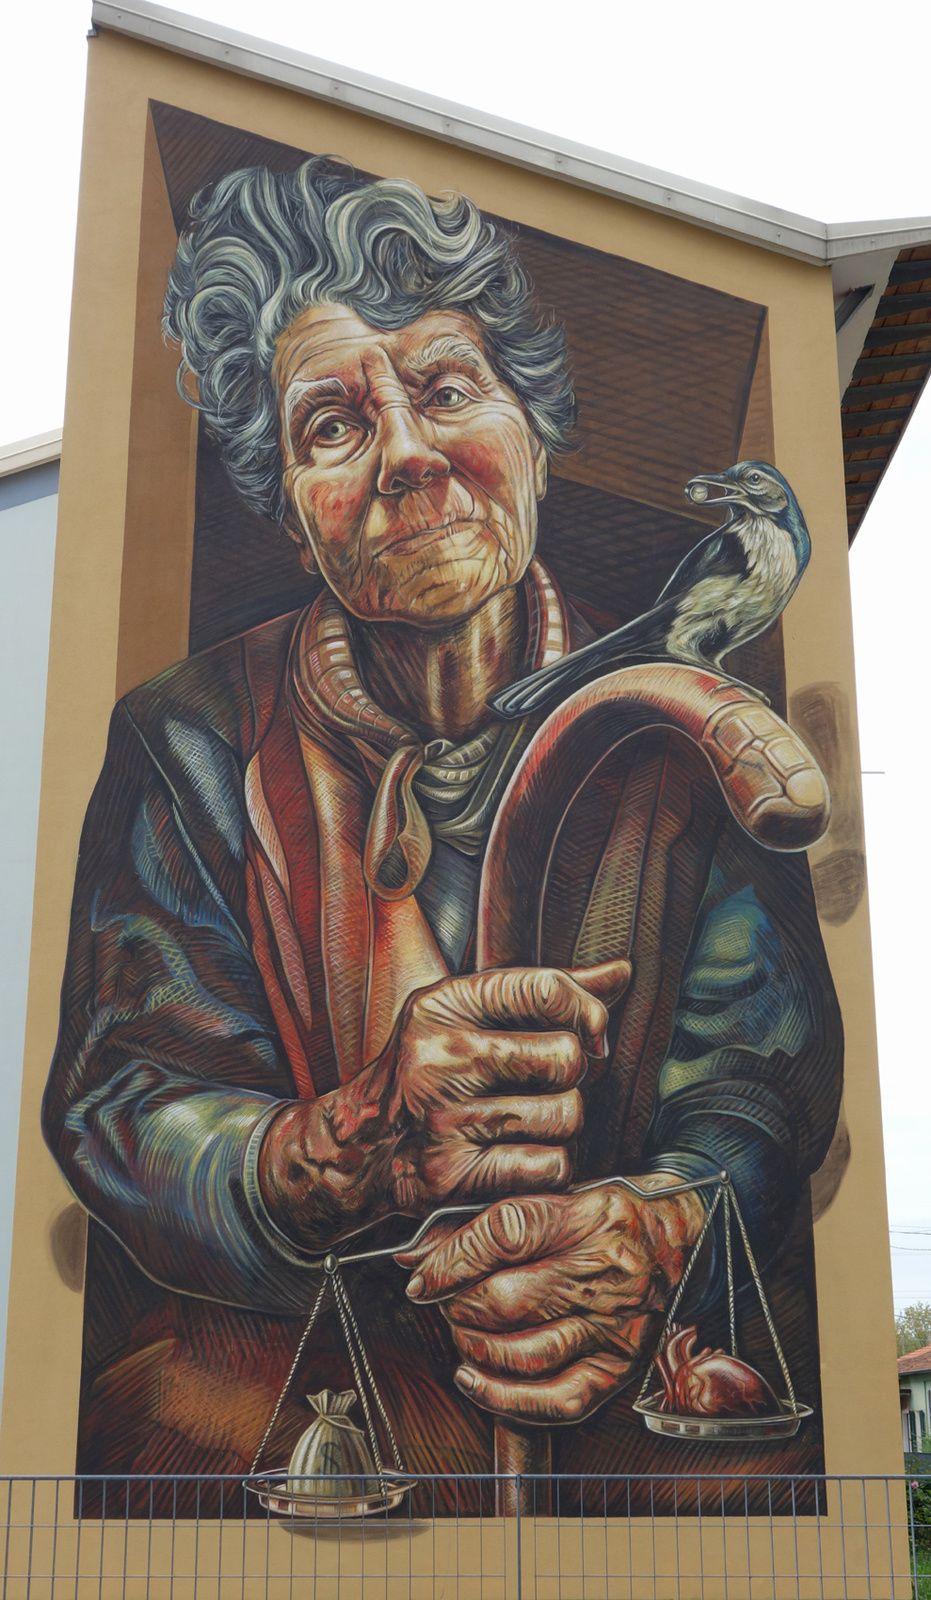 Street Art : Graffitis & Fresques Murales 25128 Brechia ( Italy )